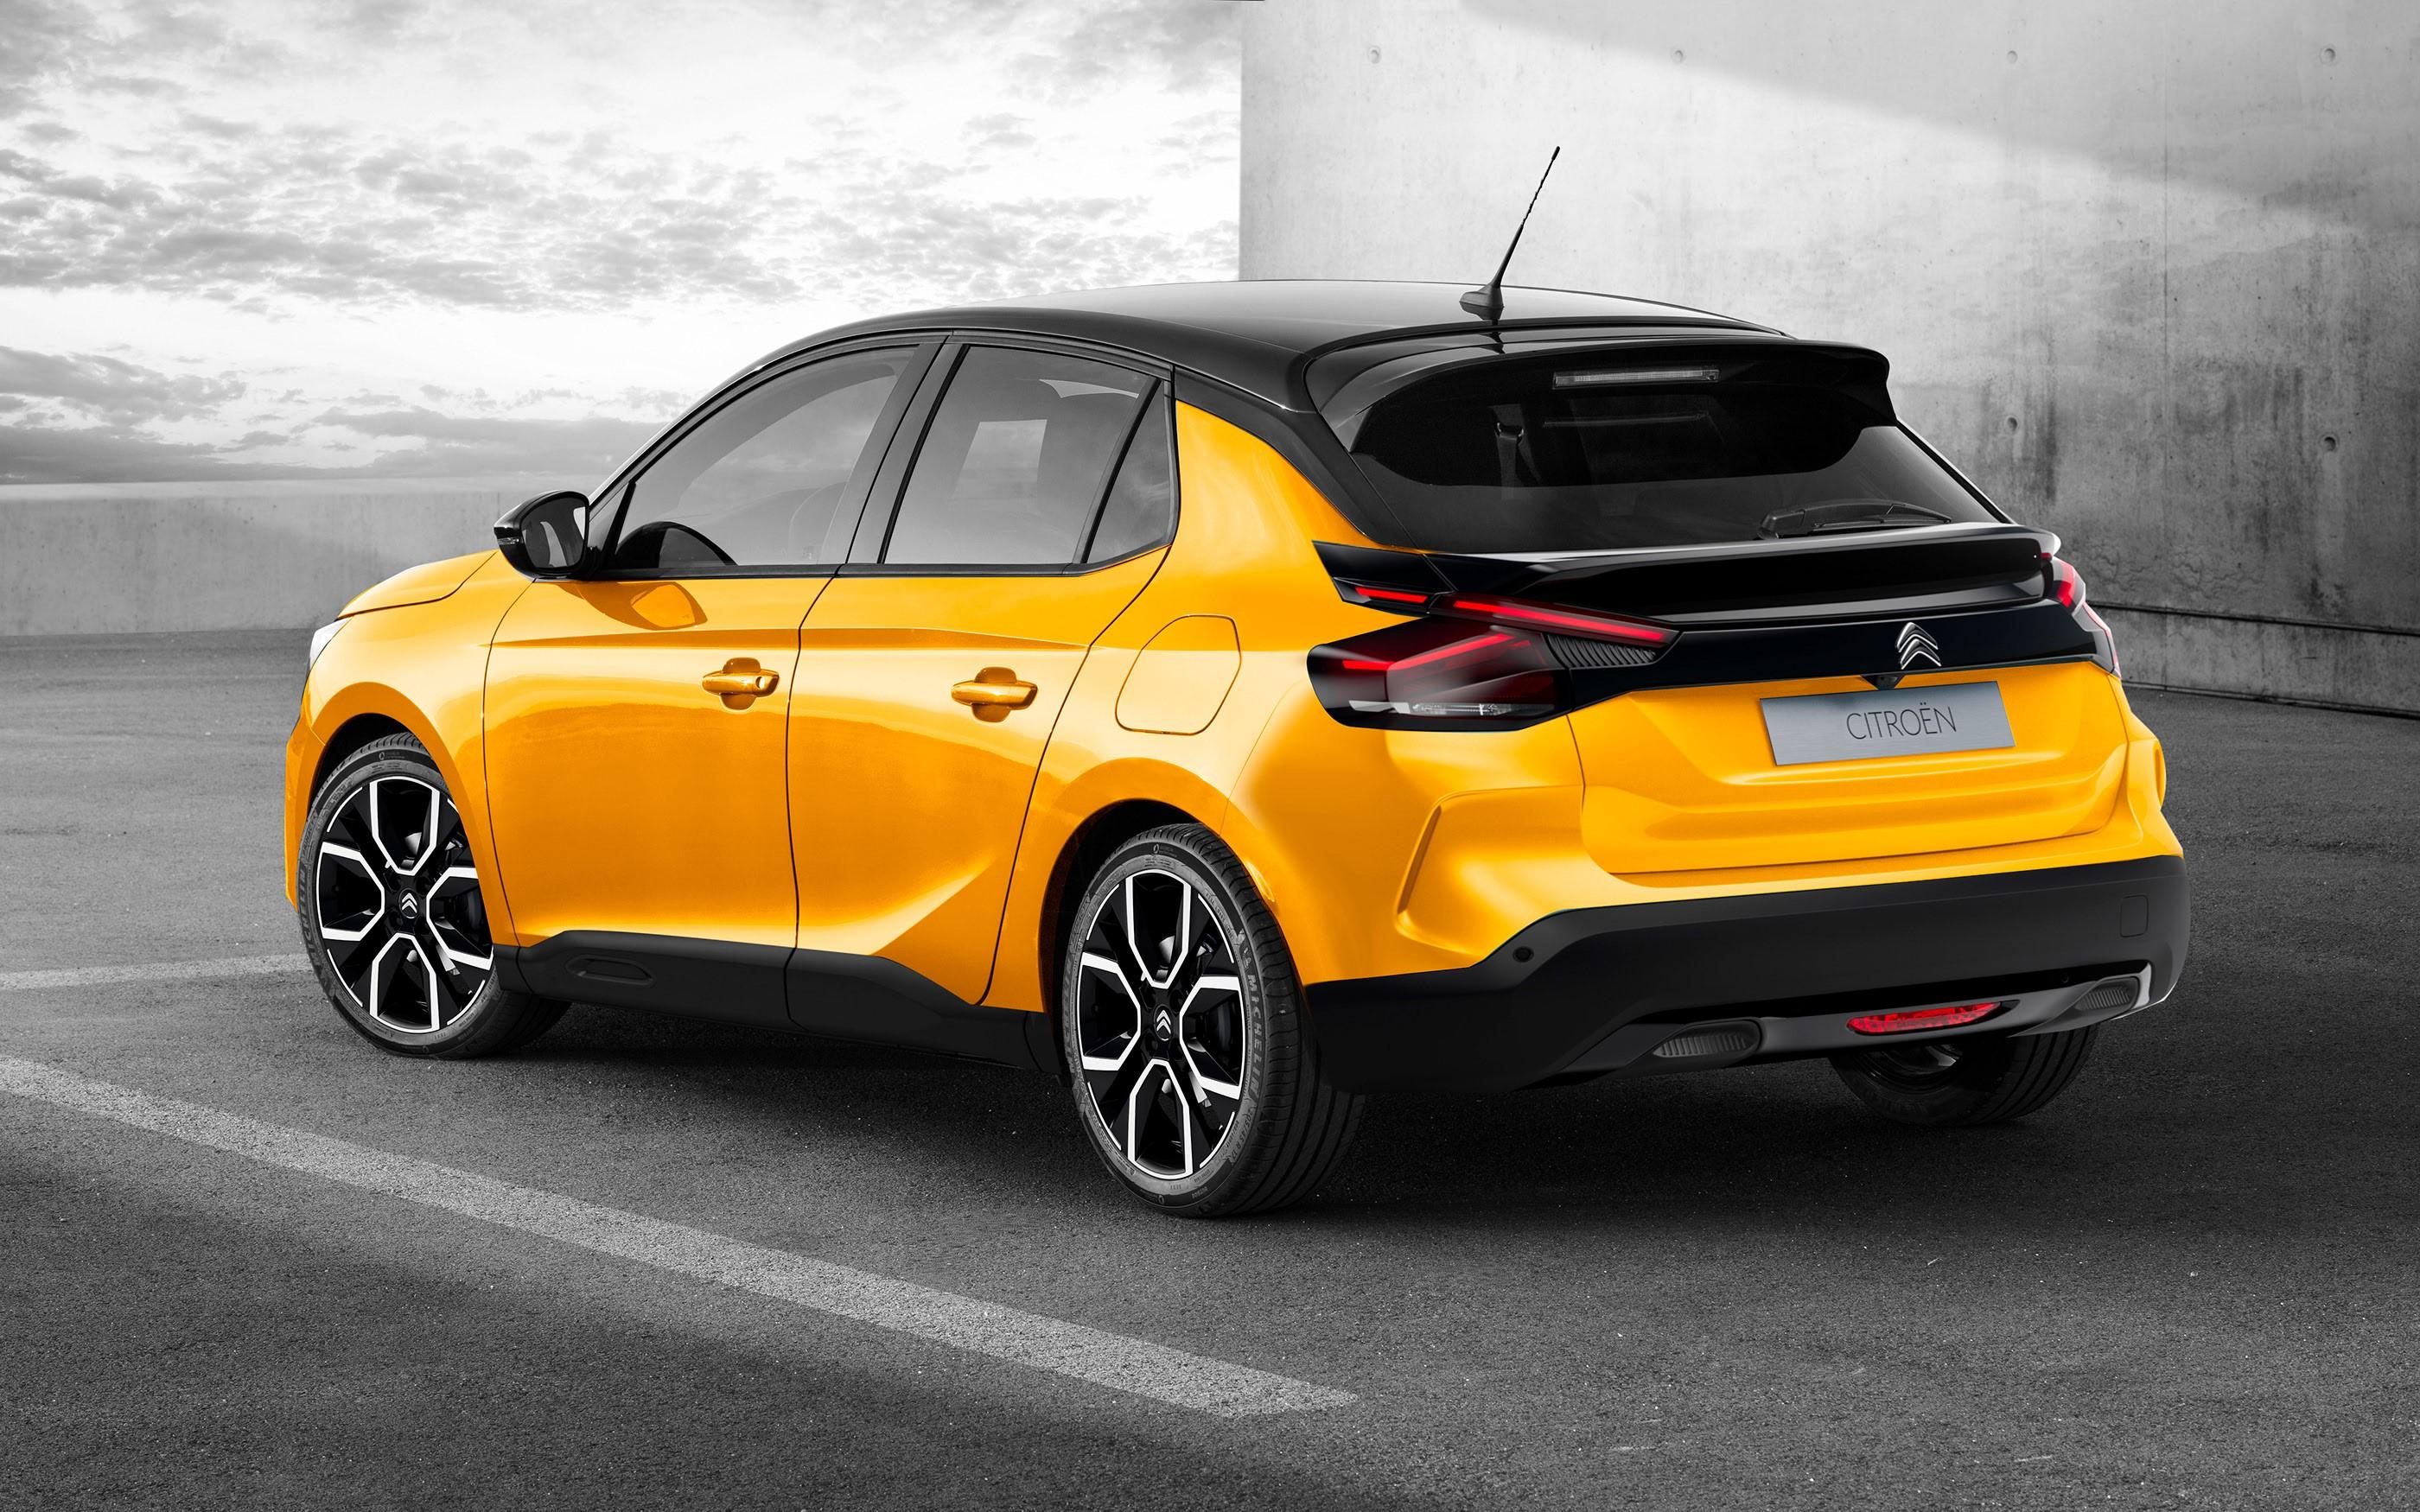 2022 - [Citroën] C3 IV 2022-citroen-c3-rendered-with-sharp-styling-ev-under-development_2